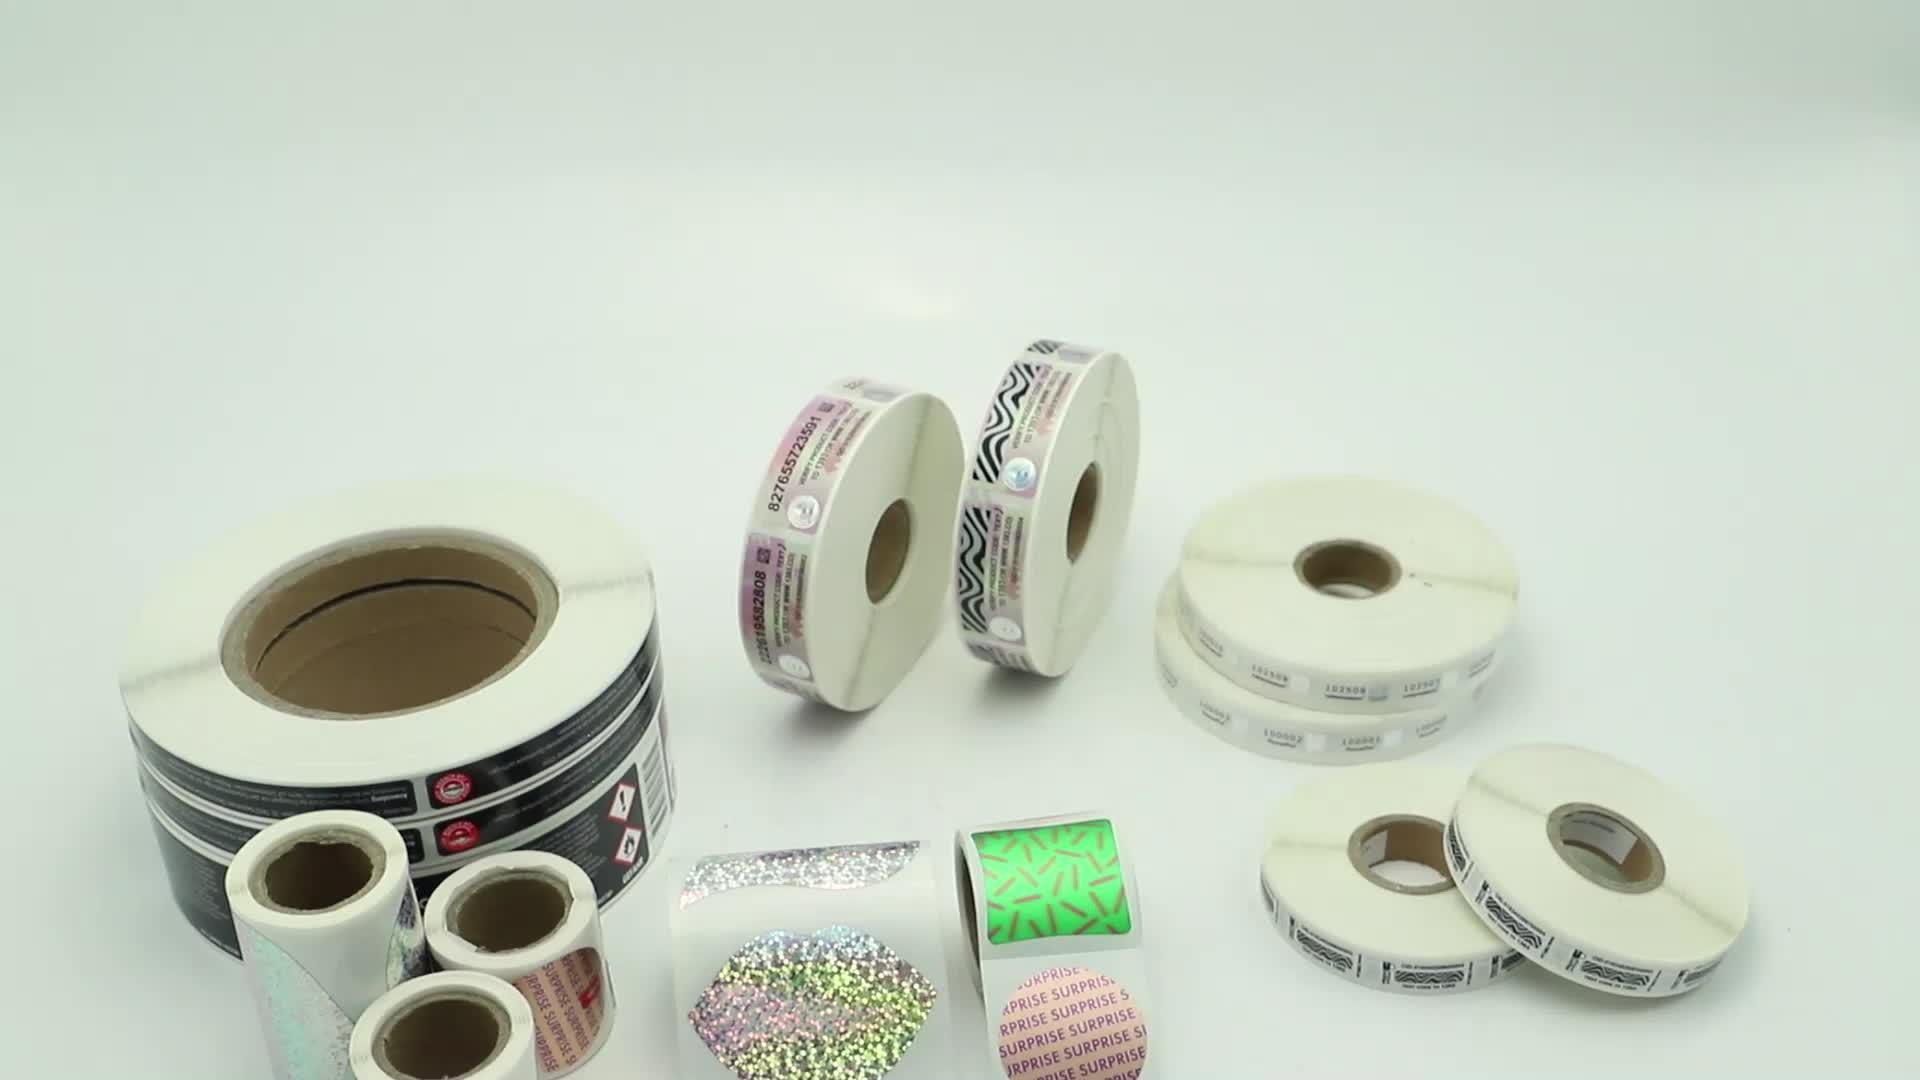 Pinnacle High Security Anti-fake Scratch Off Label and Sticker Zebra Type